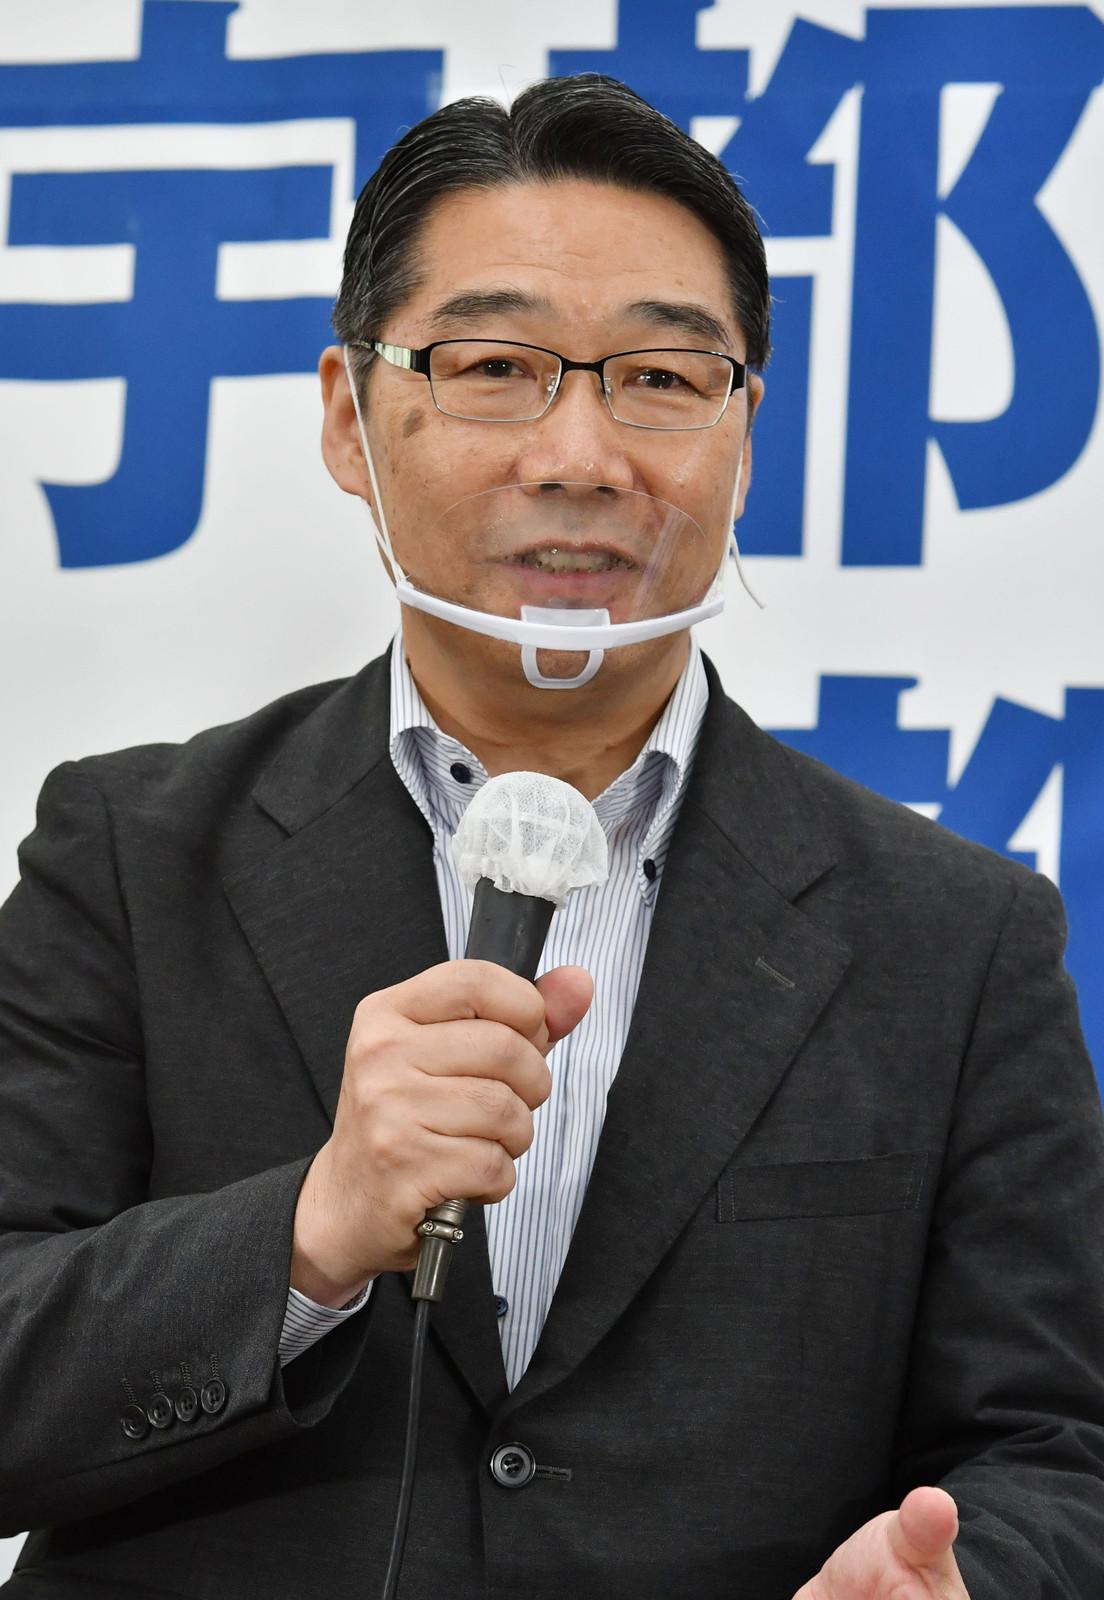 前川喜平さん 元文部科学省事務次官